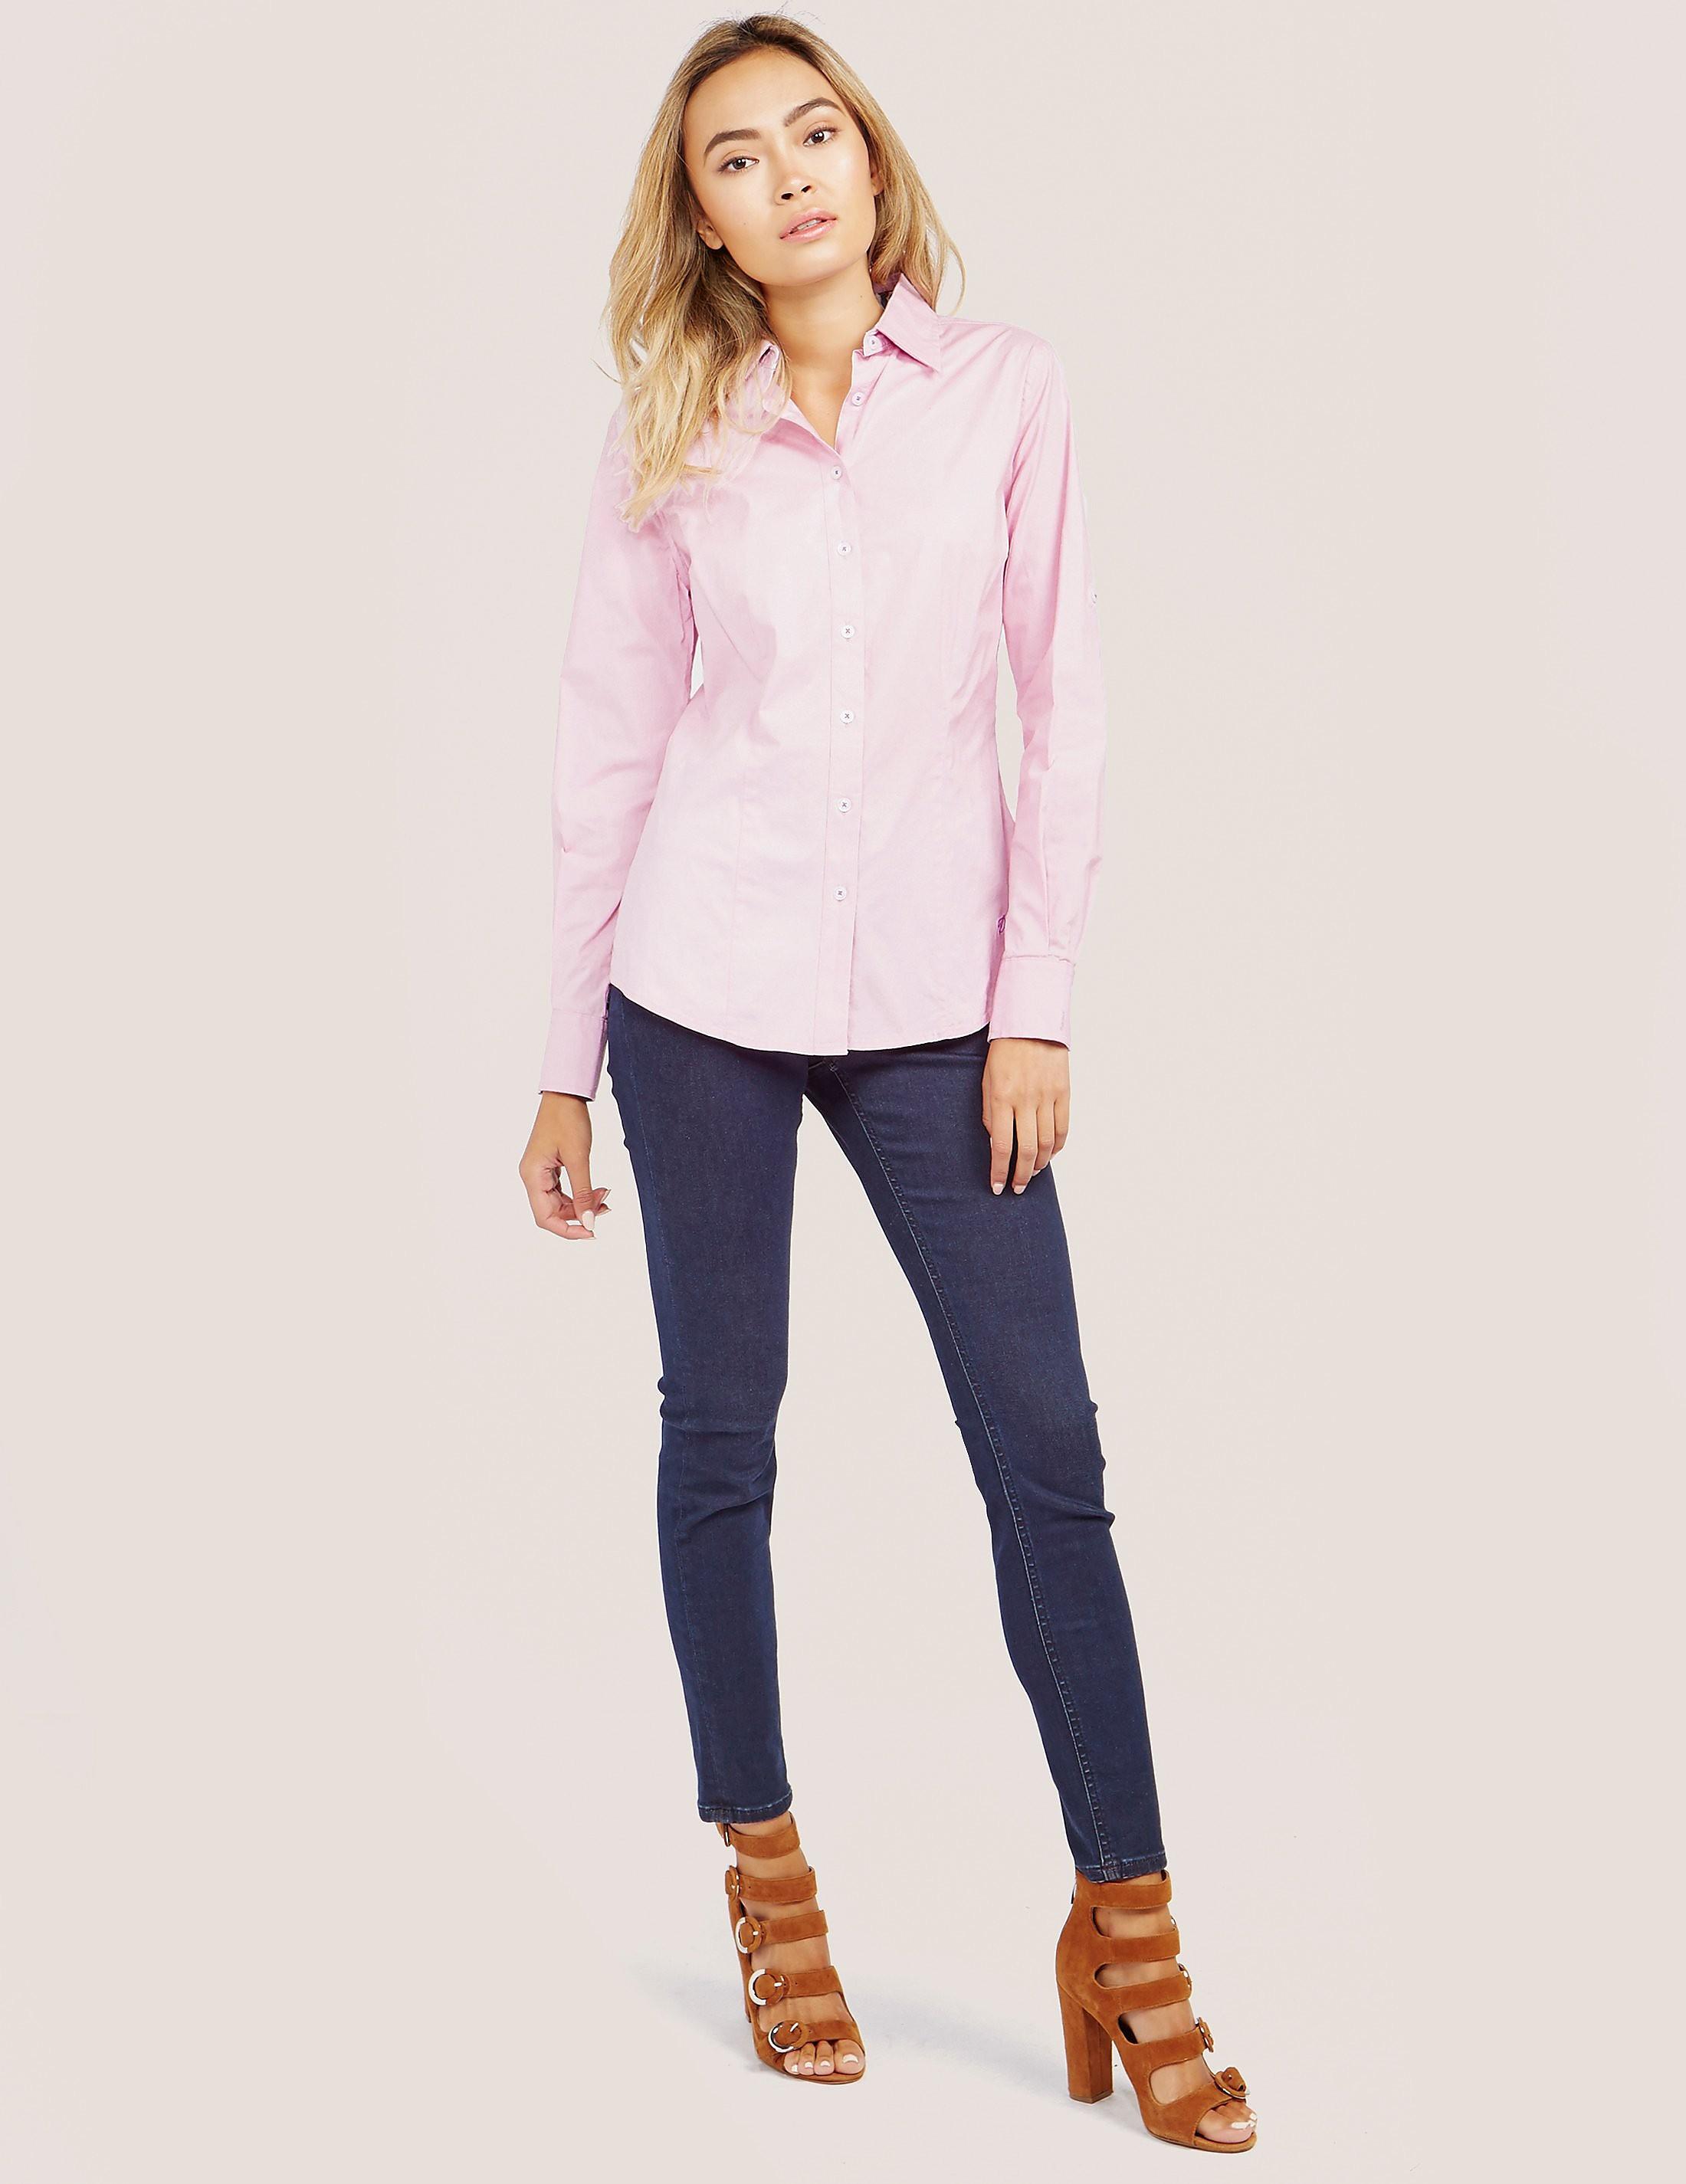 Dubarry Petunia Long Sleeve Shirt